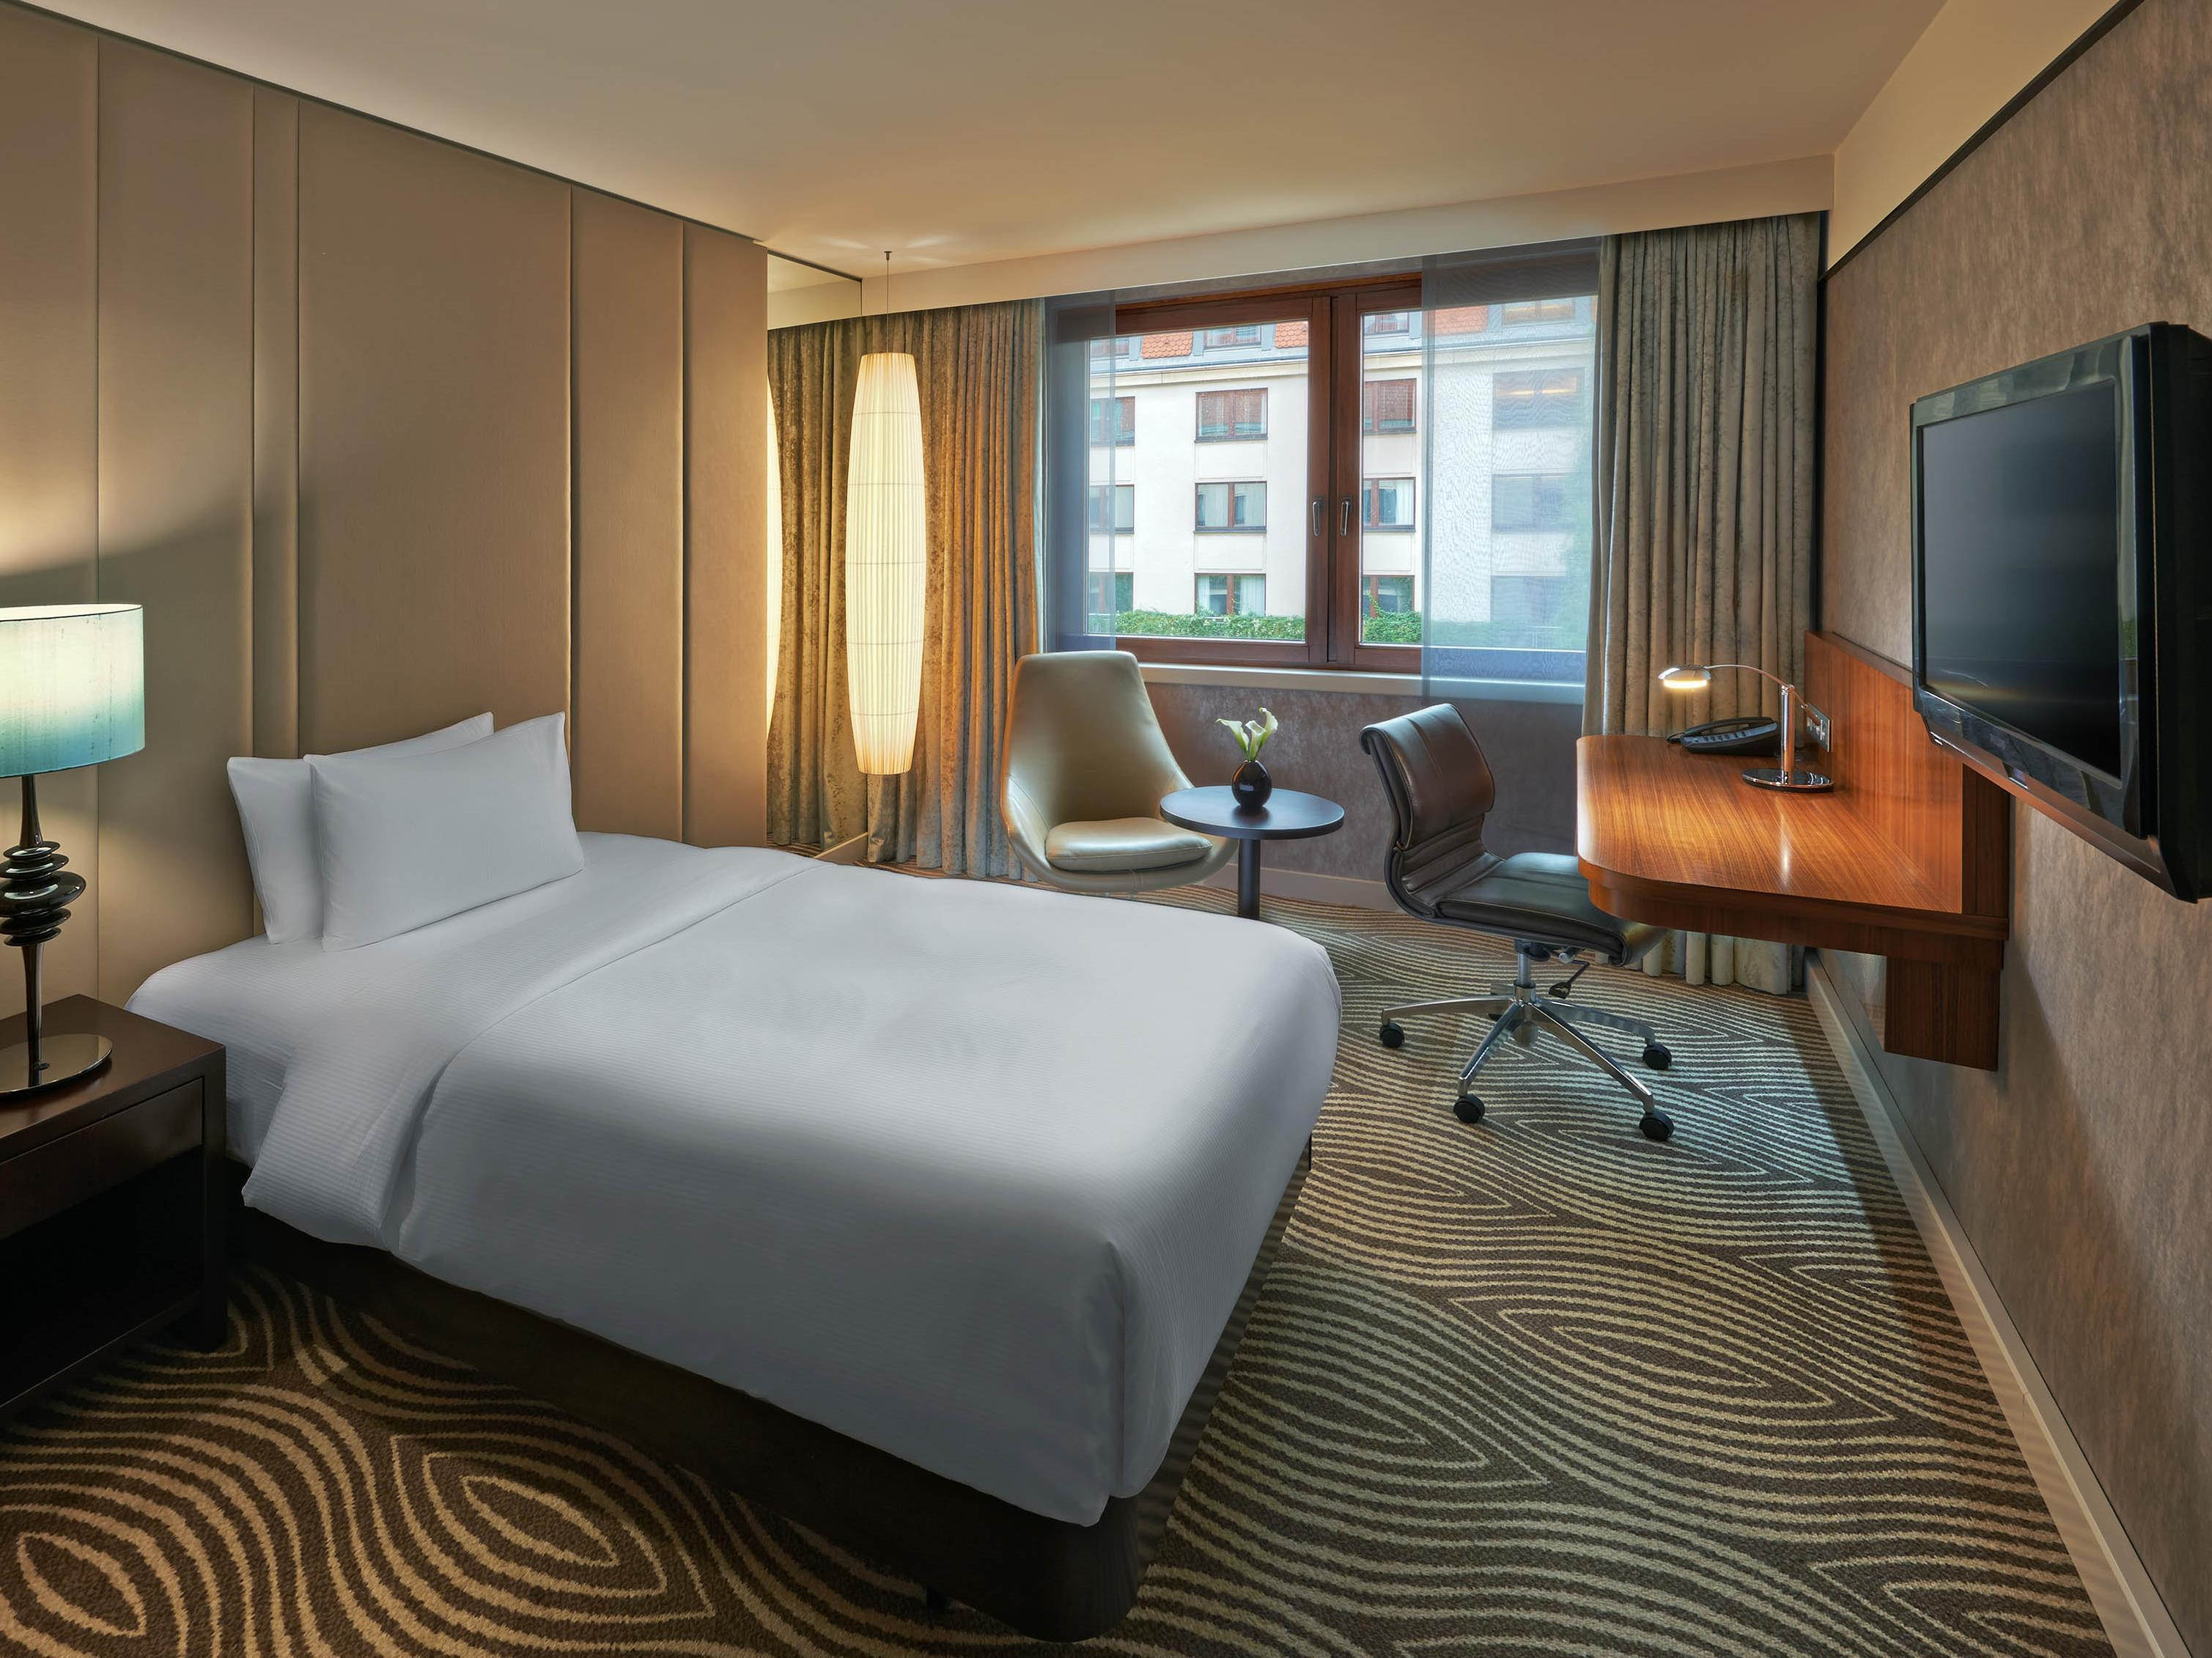 Hilton Hotel Bedding 2 Bedroom Hotel Houston Tx 100 Doubletree By Hilton Cape Cod Hampton Inn